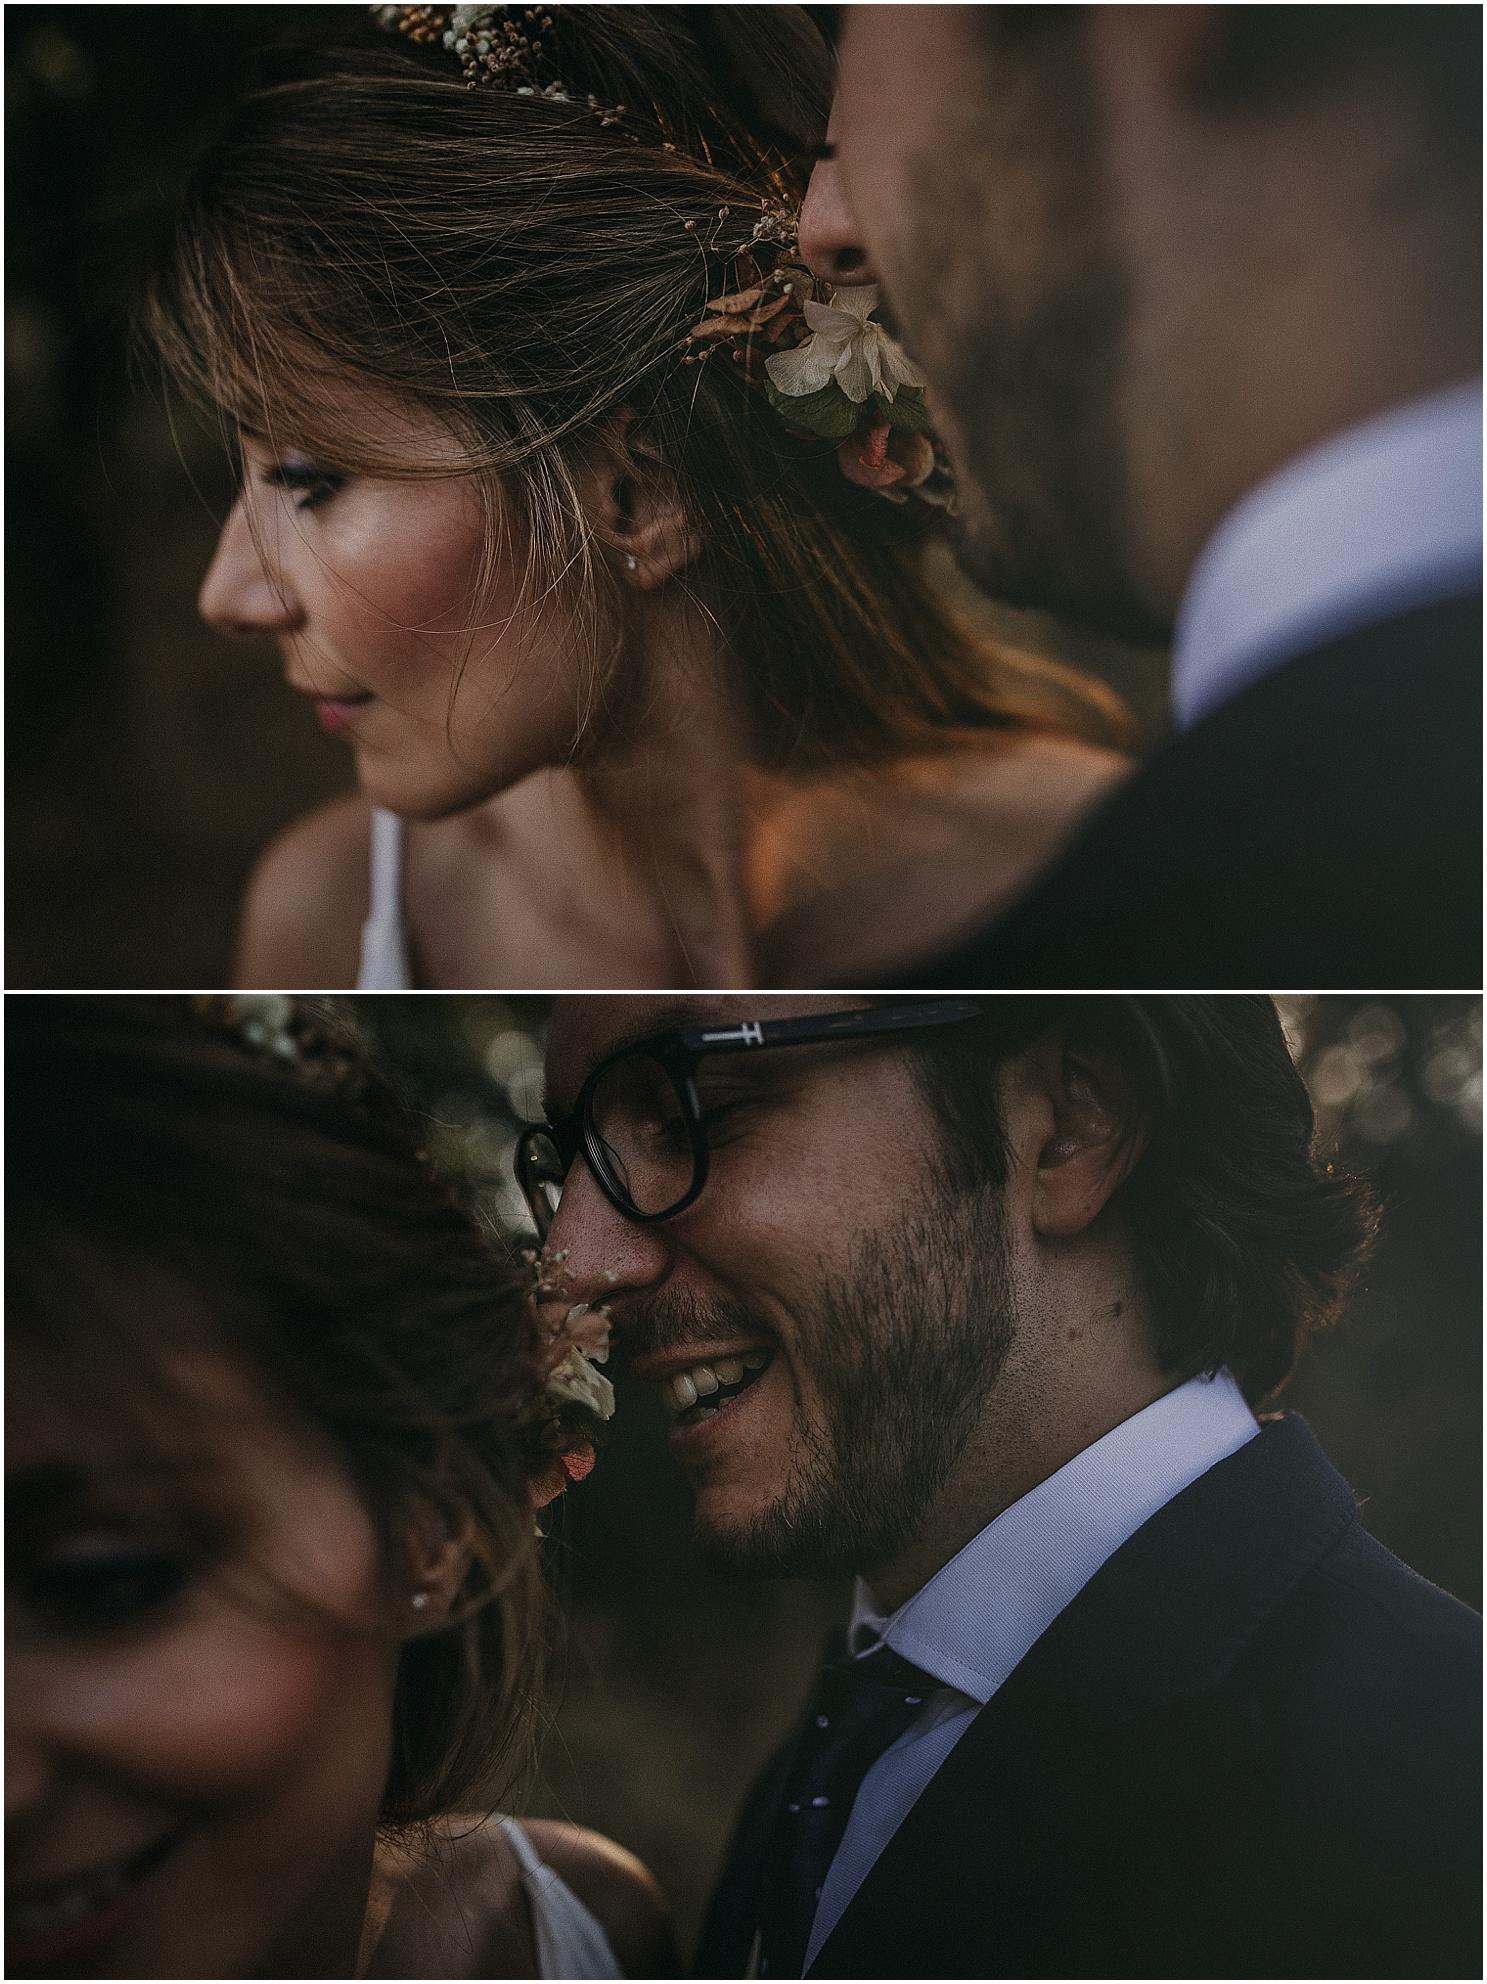 Macarena y Jordi - boda en valencia - Pablo Laguia (27).jpg